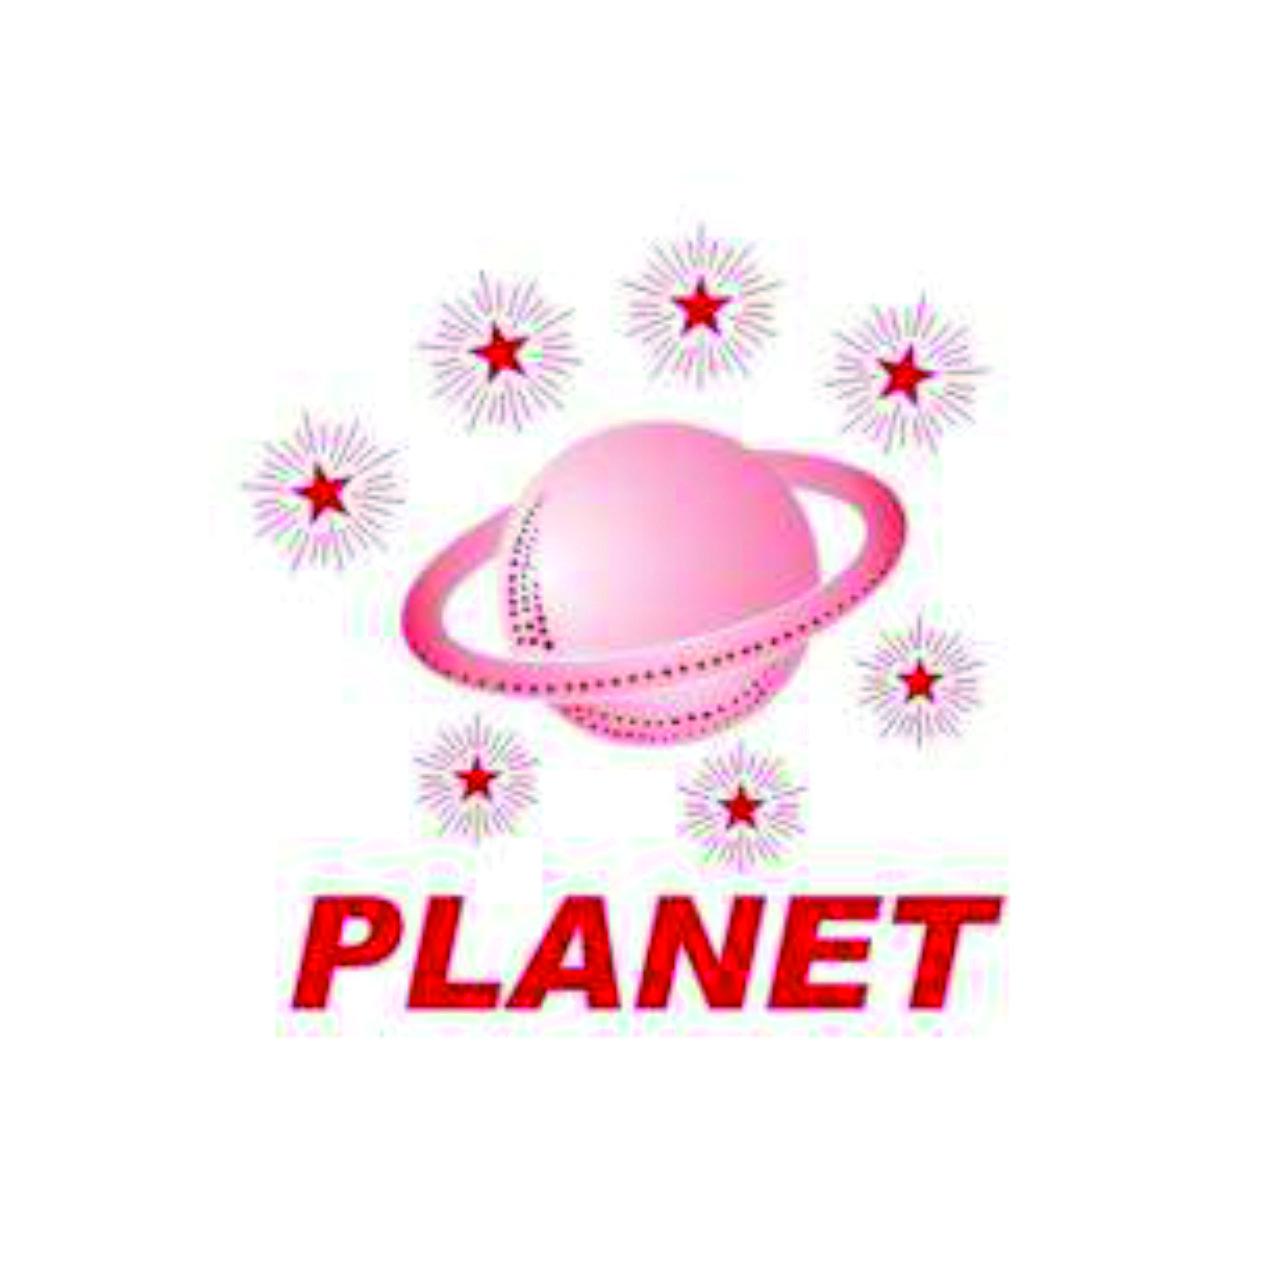 Lilin Merk Planet